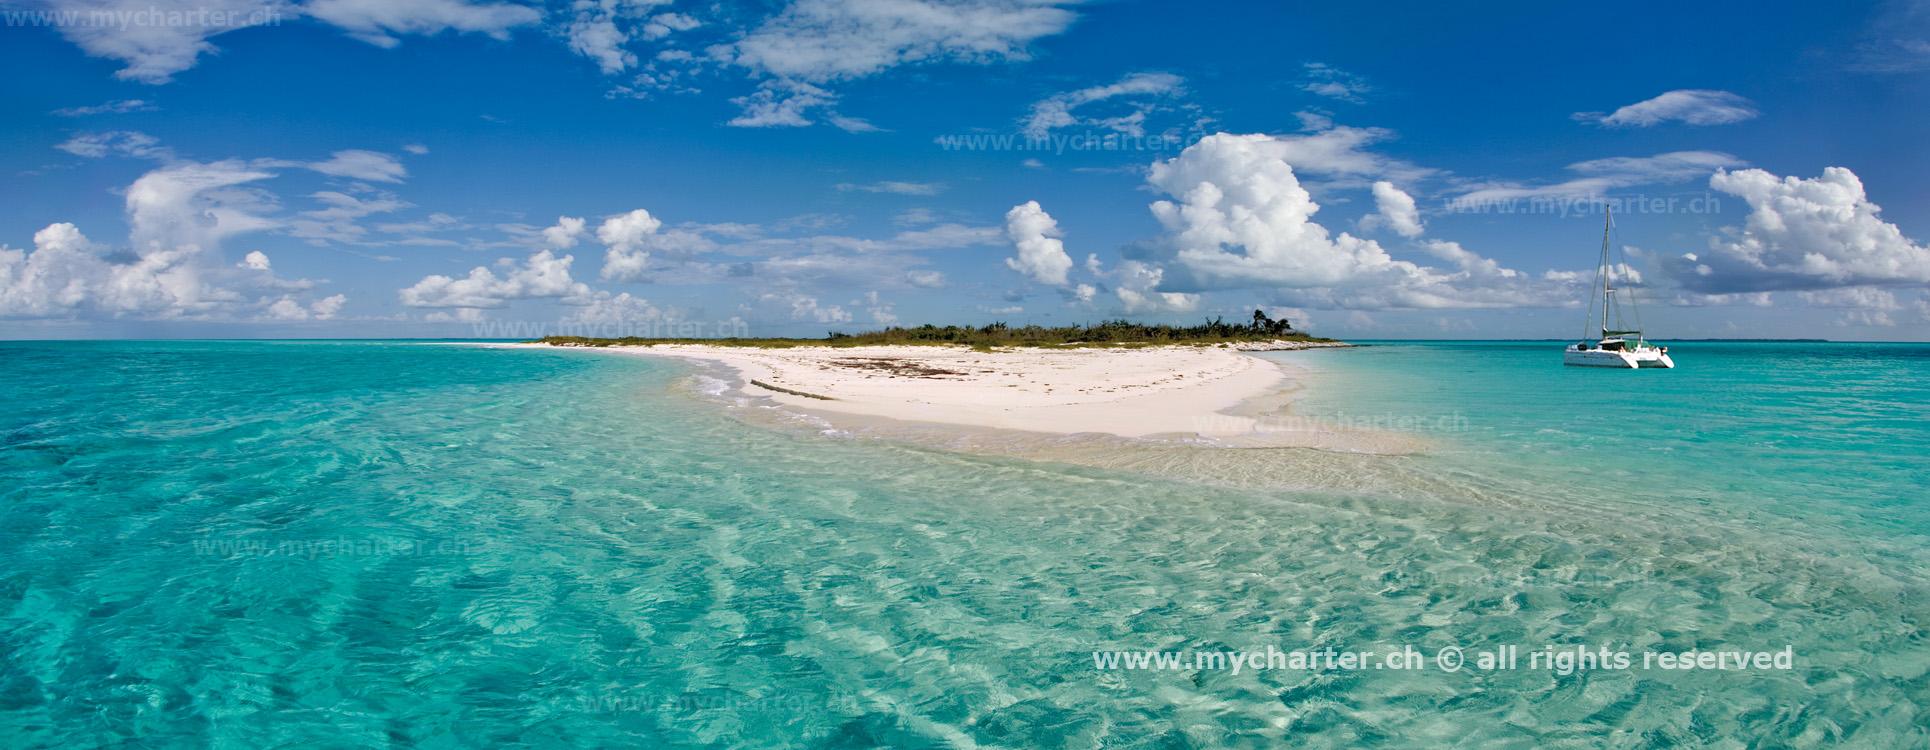 Bahamas - Schooner Cays - Eleuthera